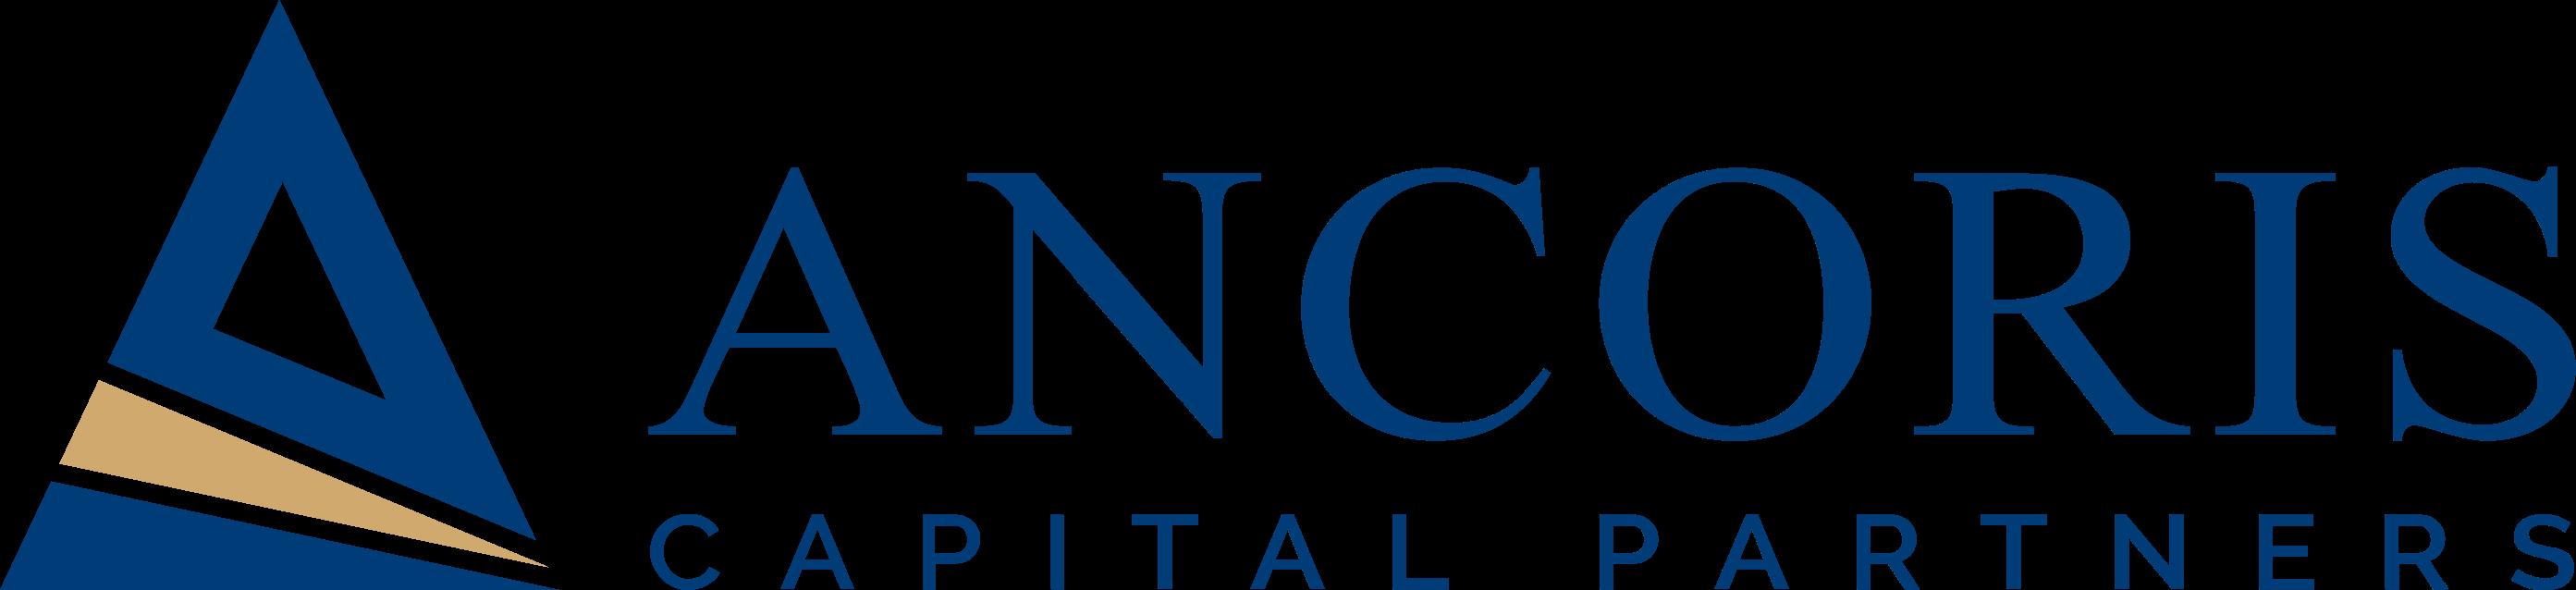 Ancoris Capital Partners